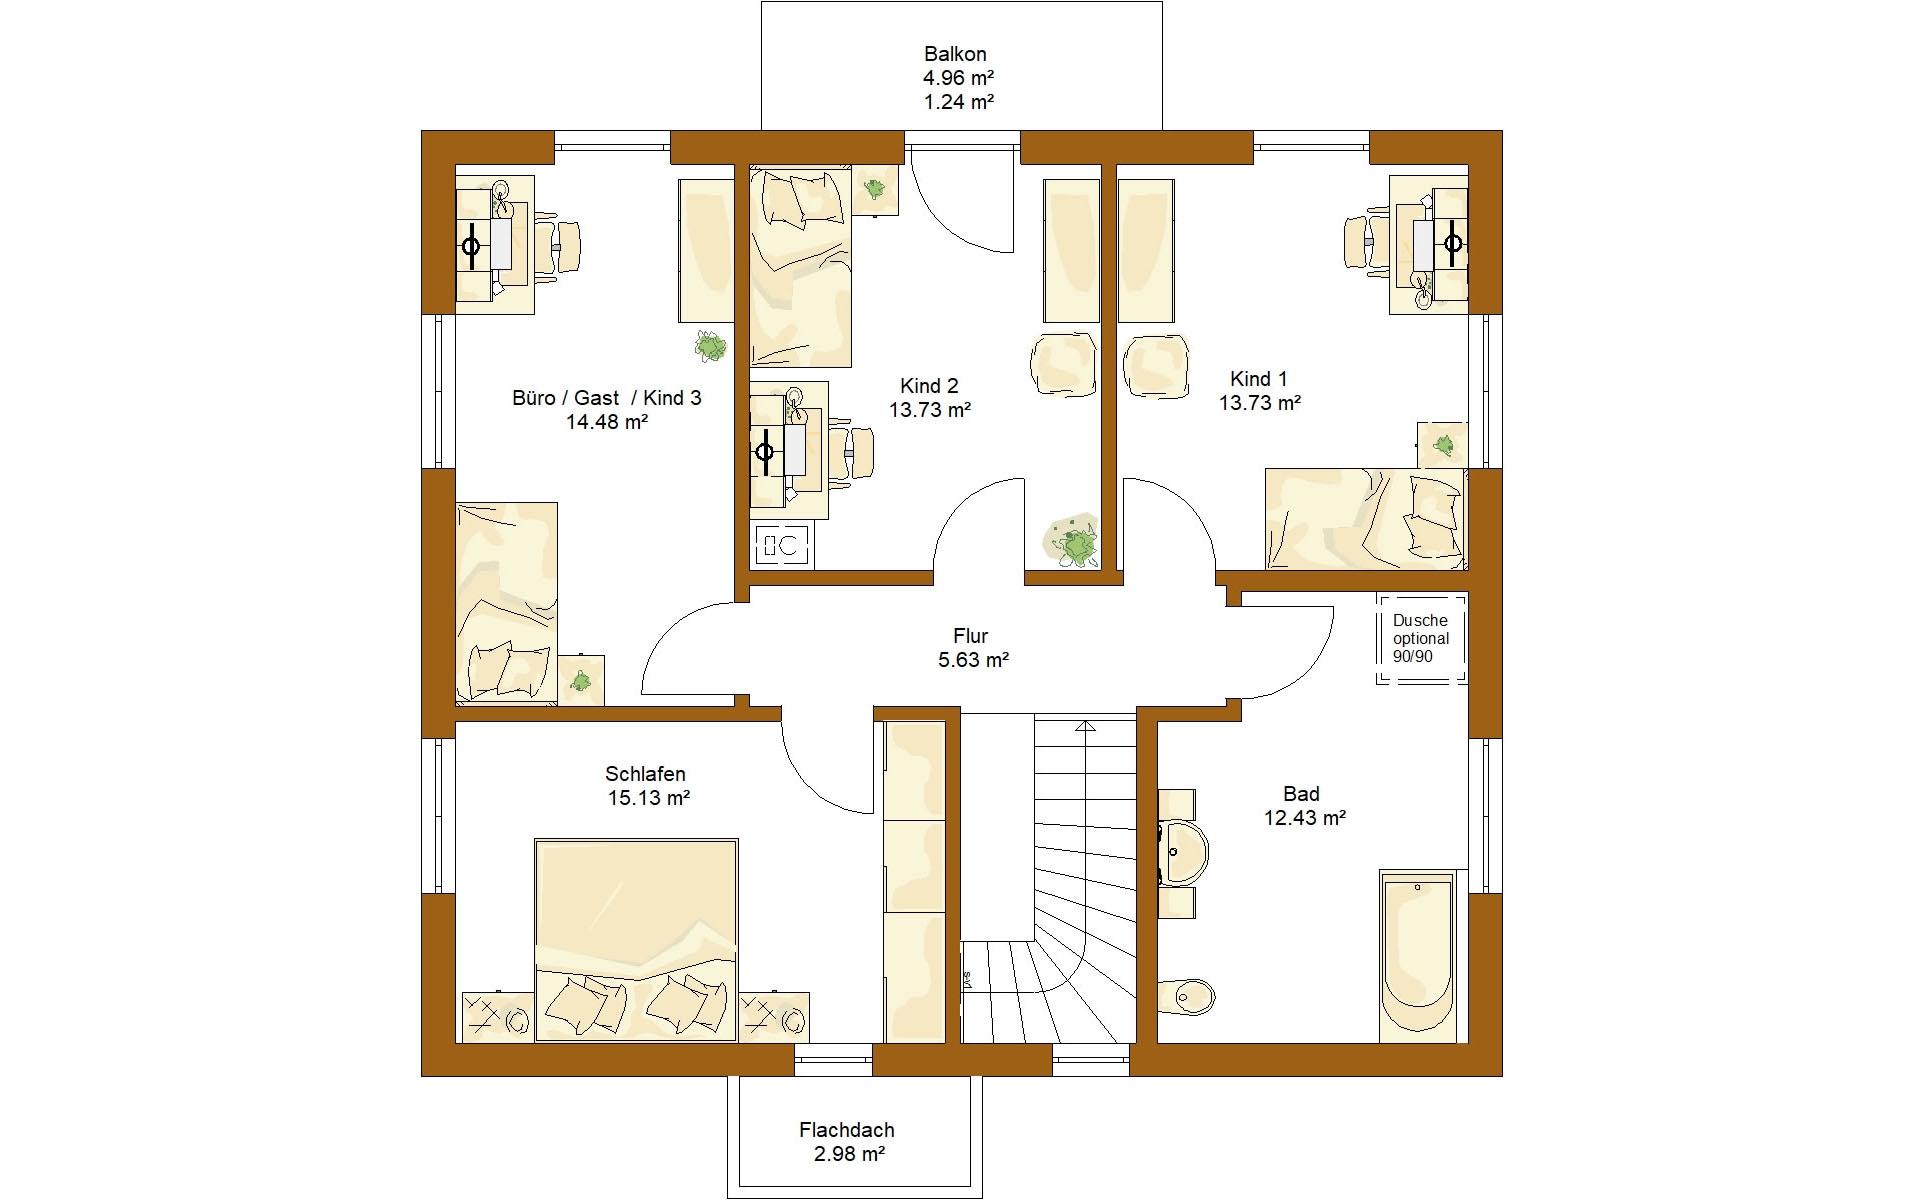 Obergeschoss CLOU 157 Satteldach von RENSCH-HAUS GMBH